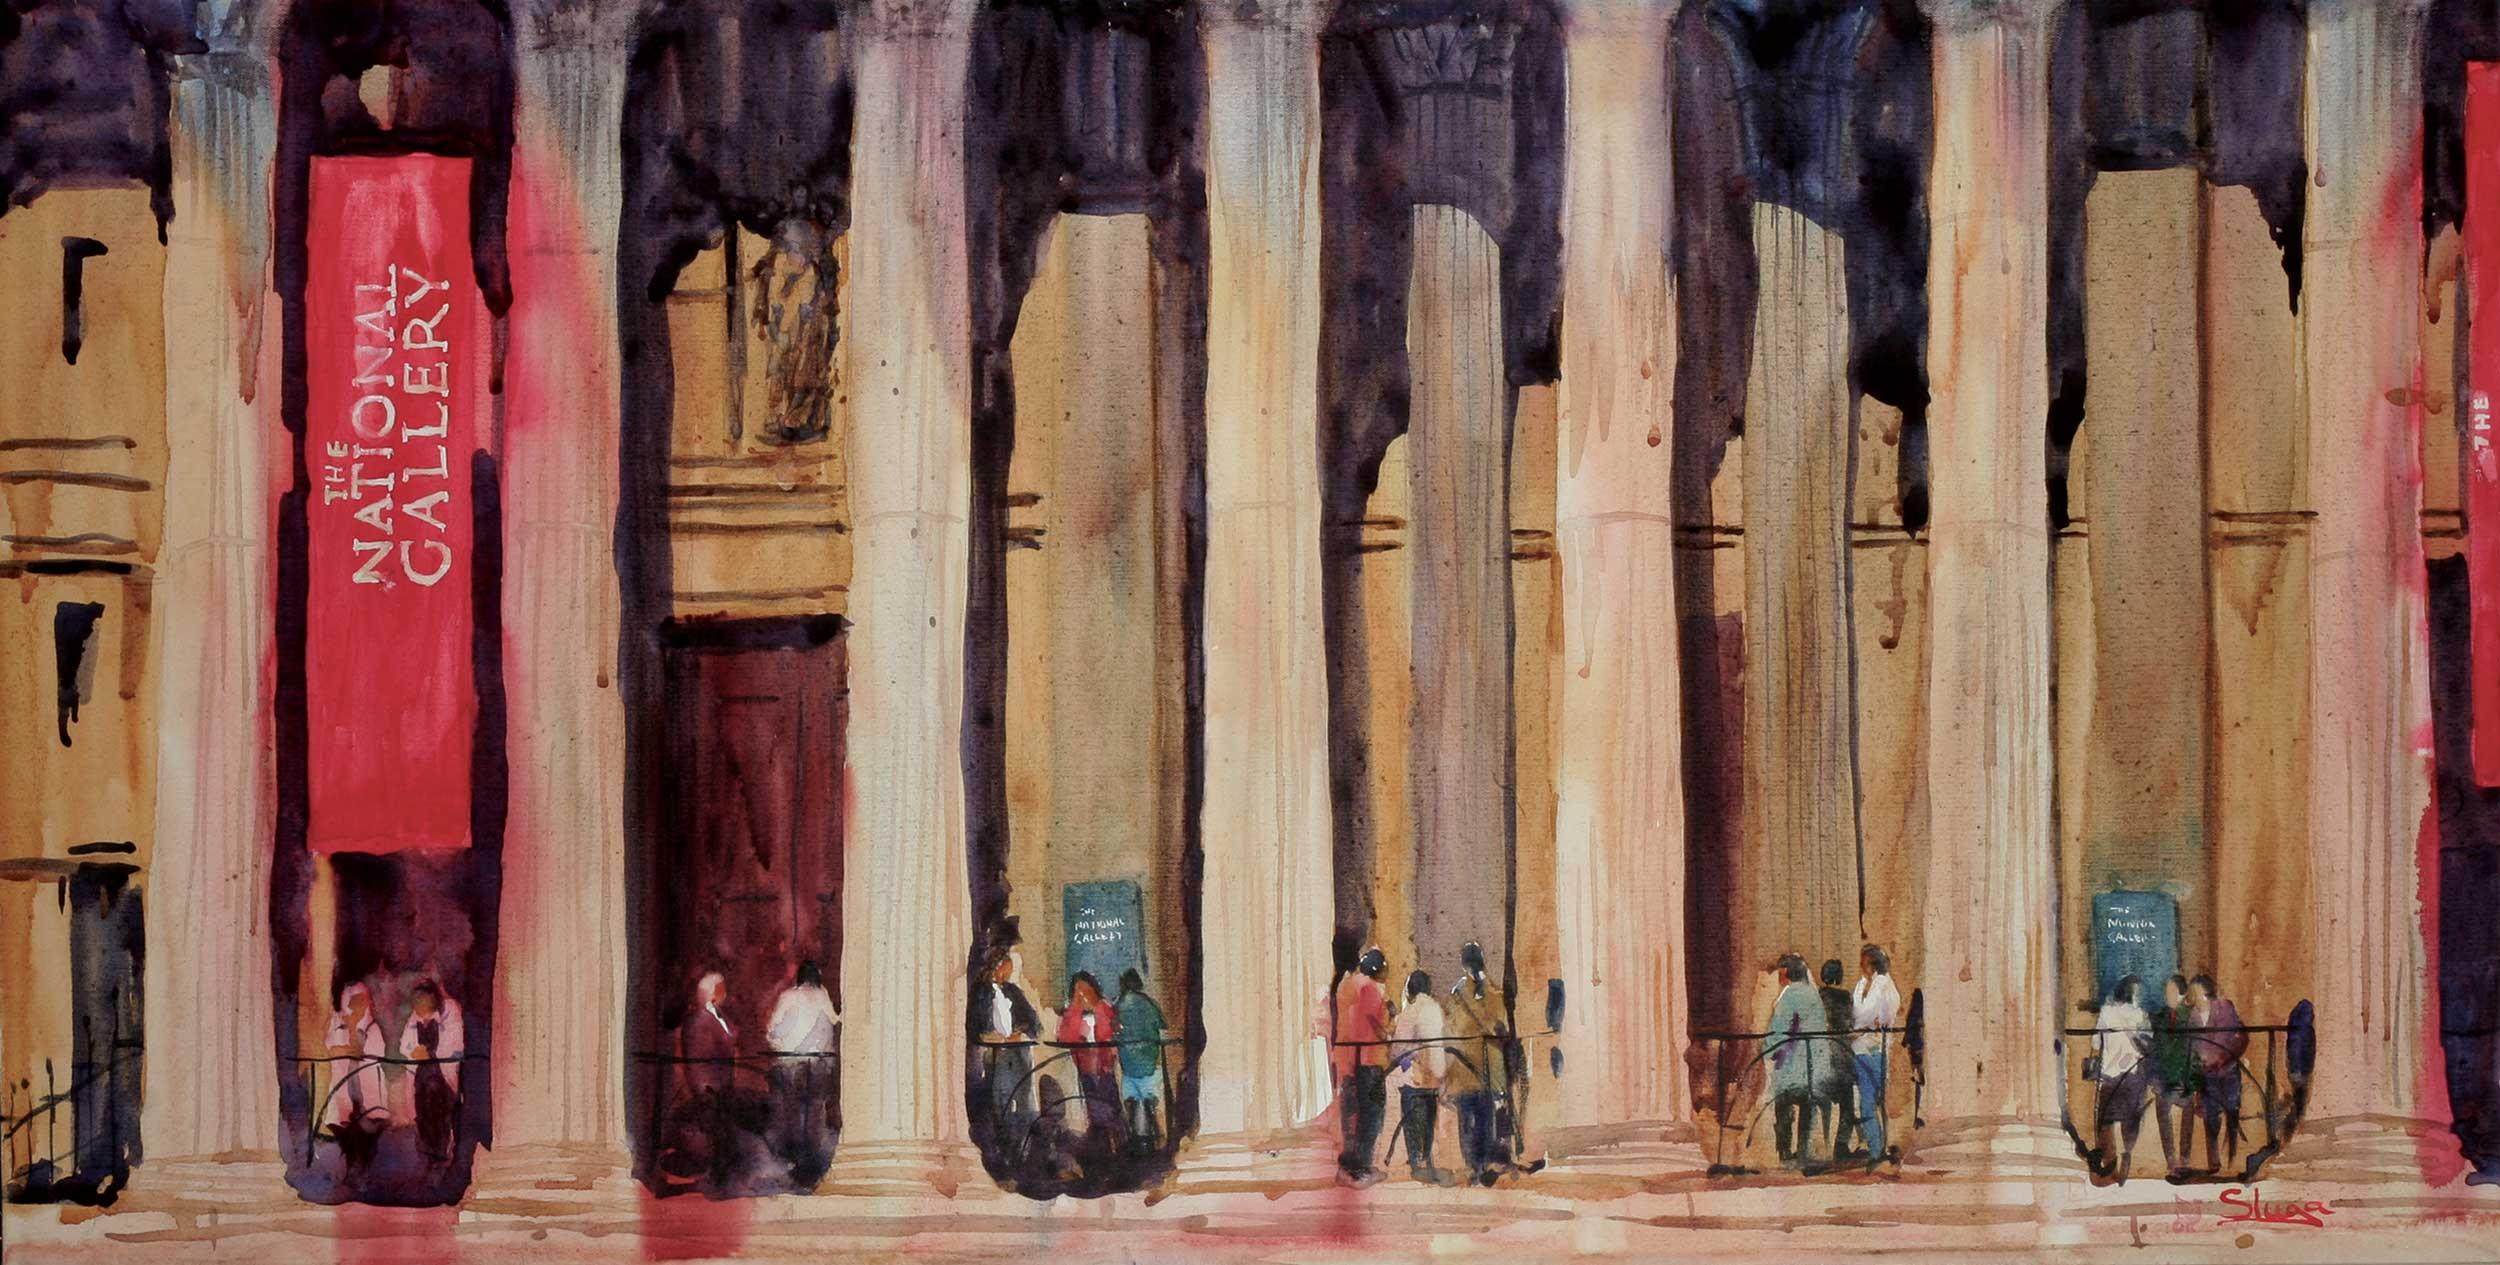 National Gallery, London 122 x 61 cm